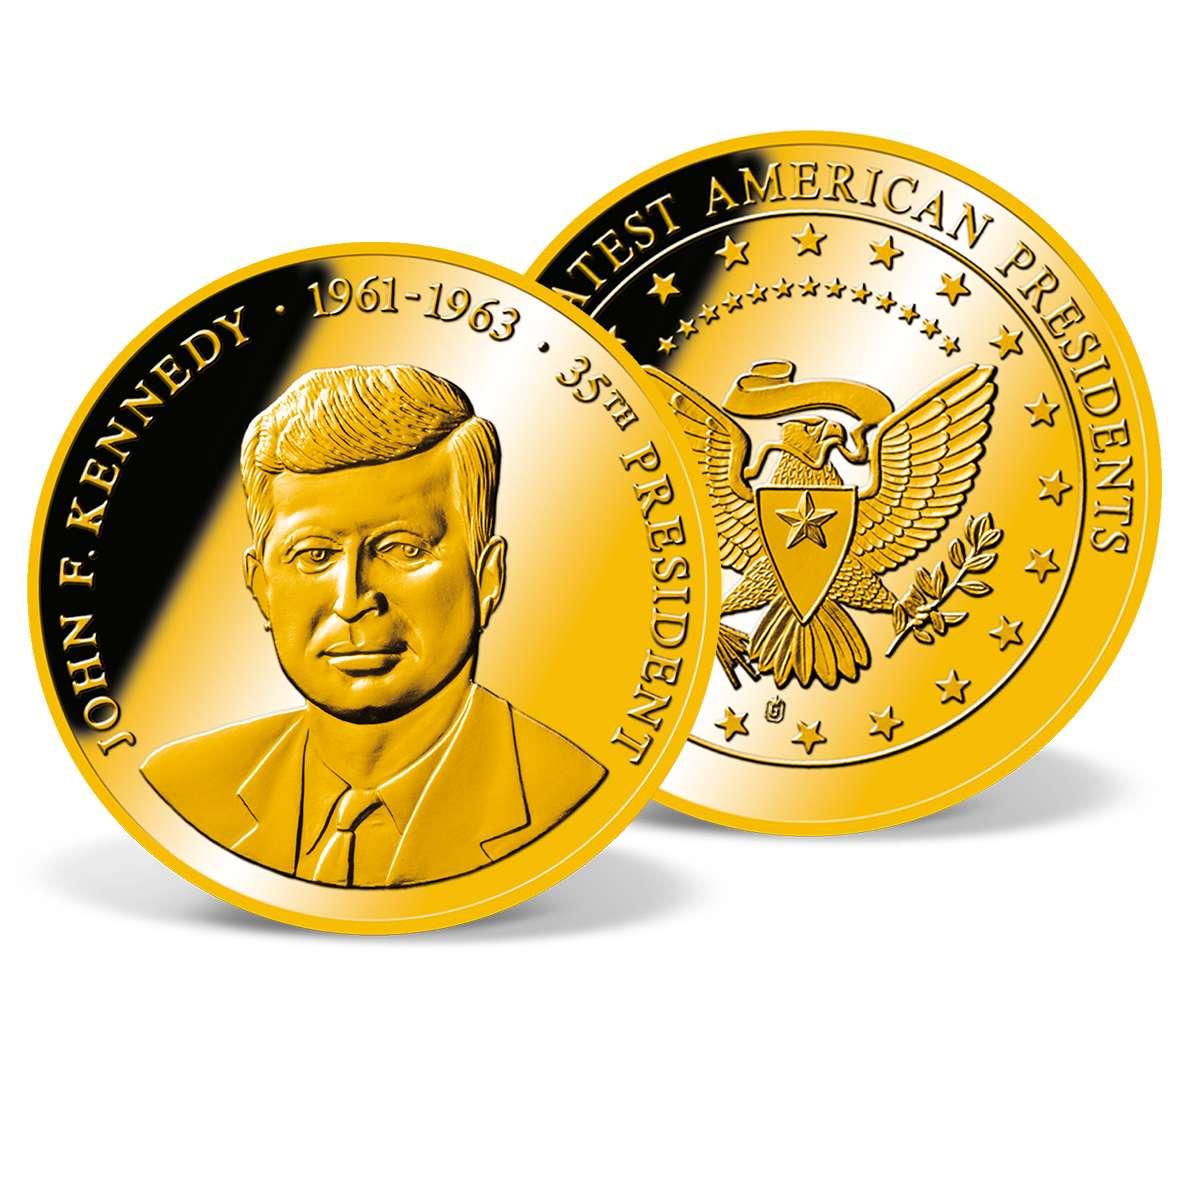 john fitzgerald kennedy coin